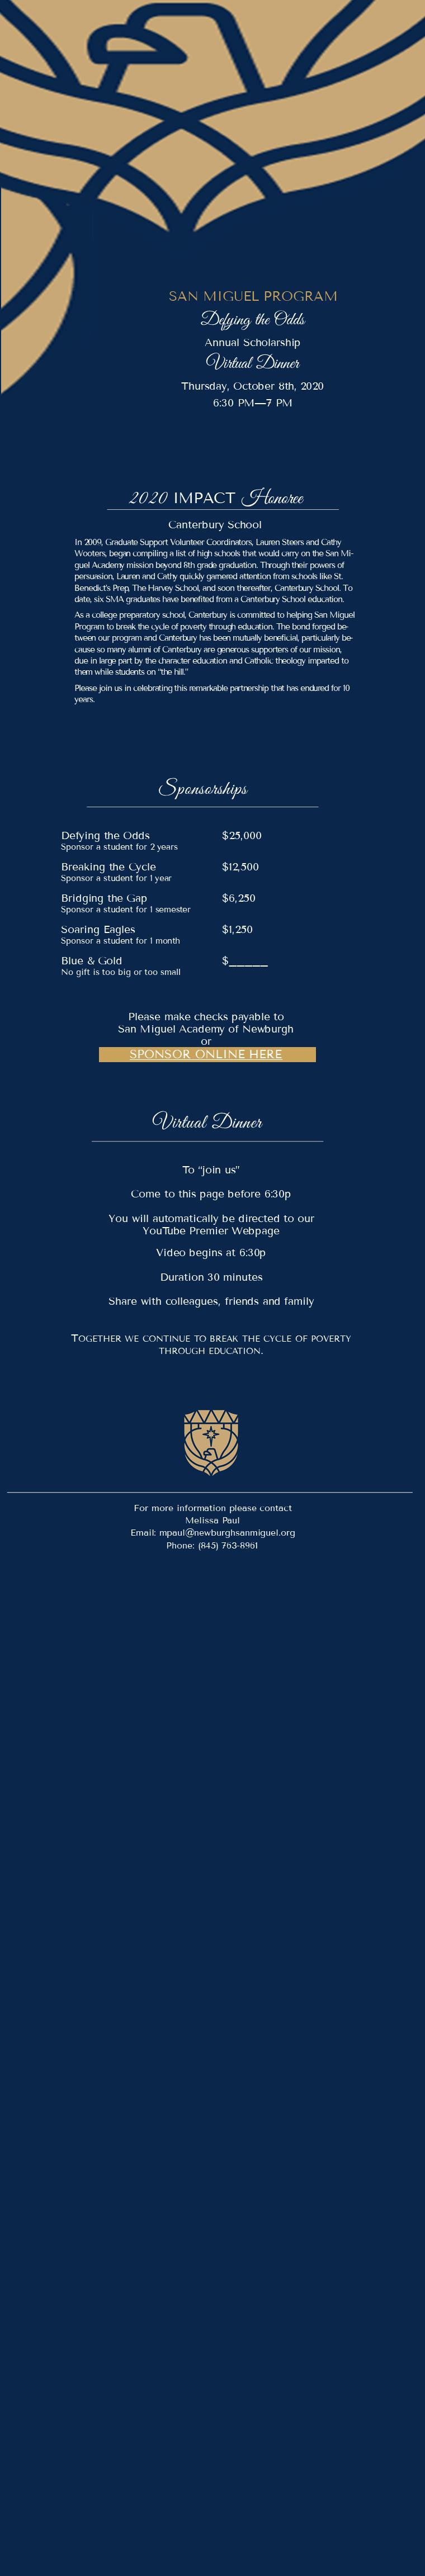 2020 Dinner WEBPAGE